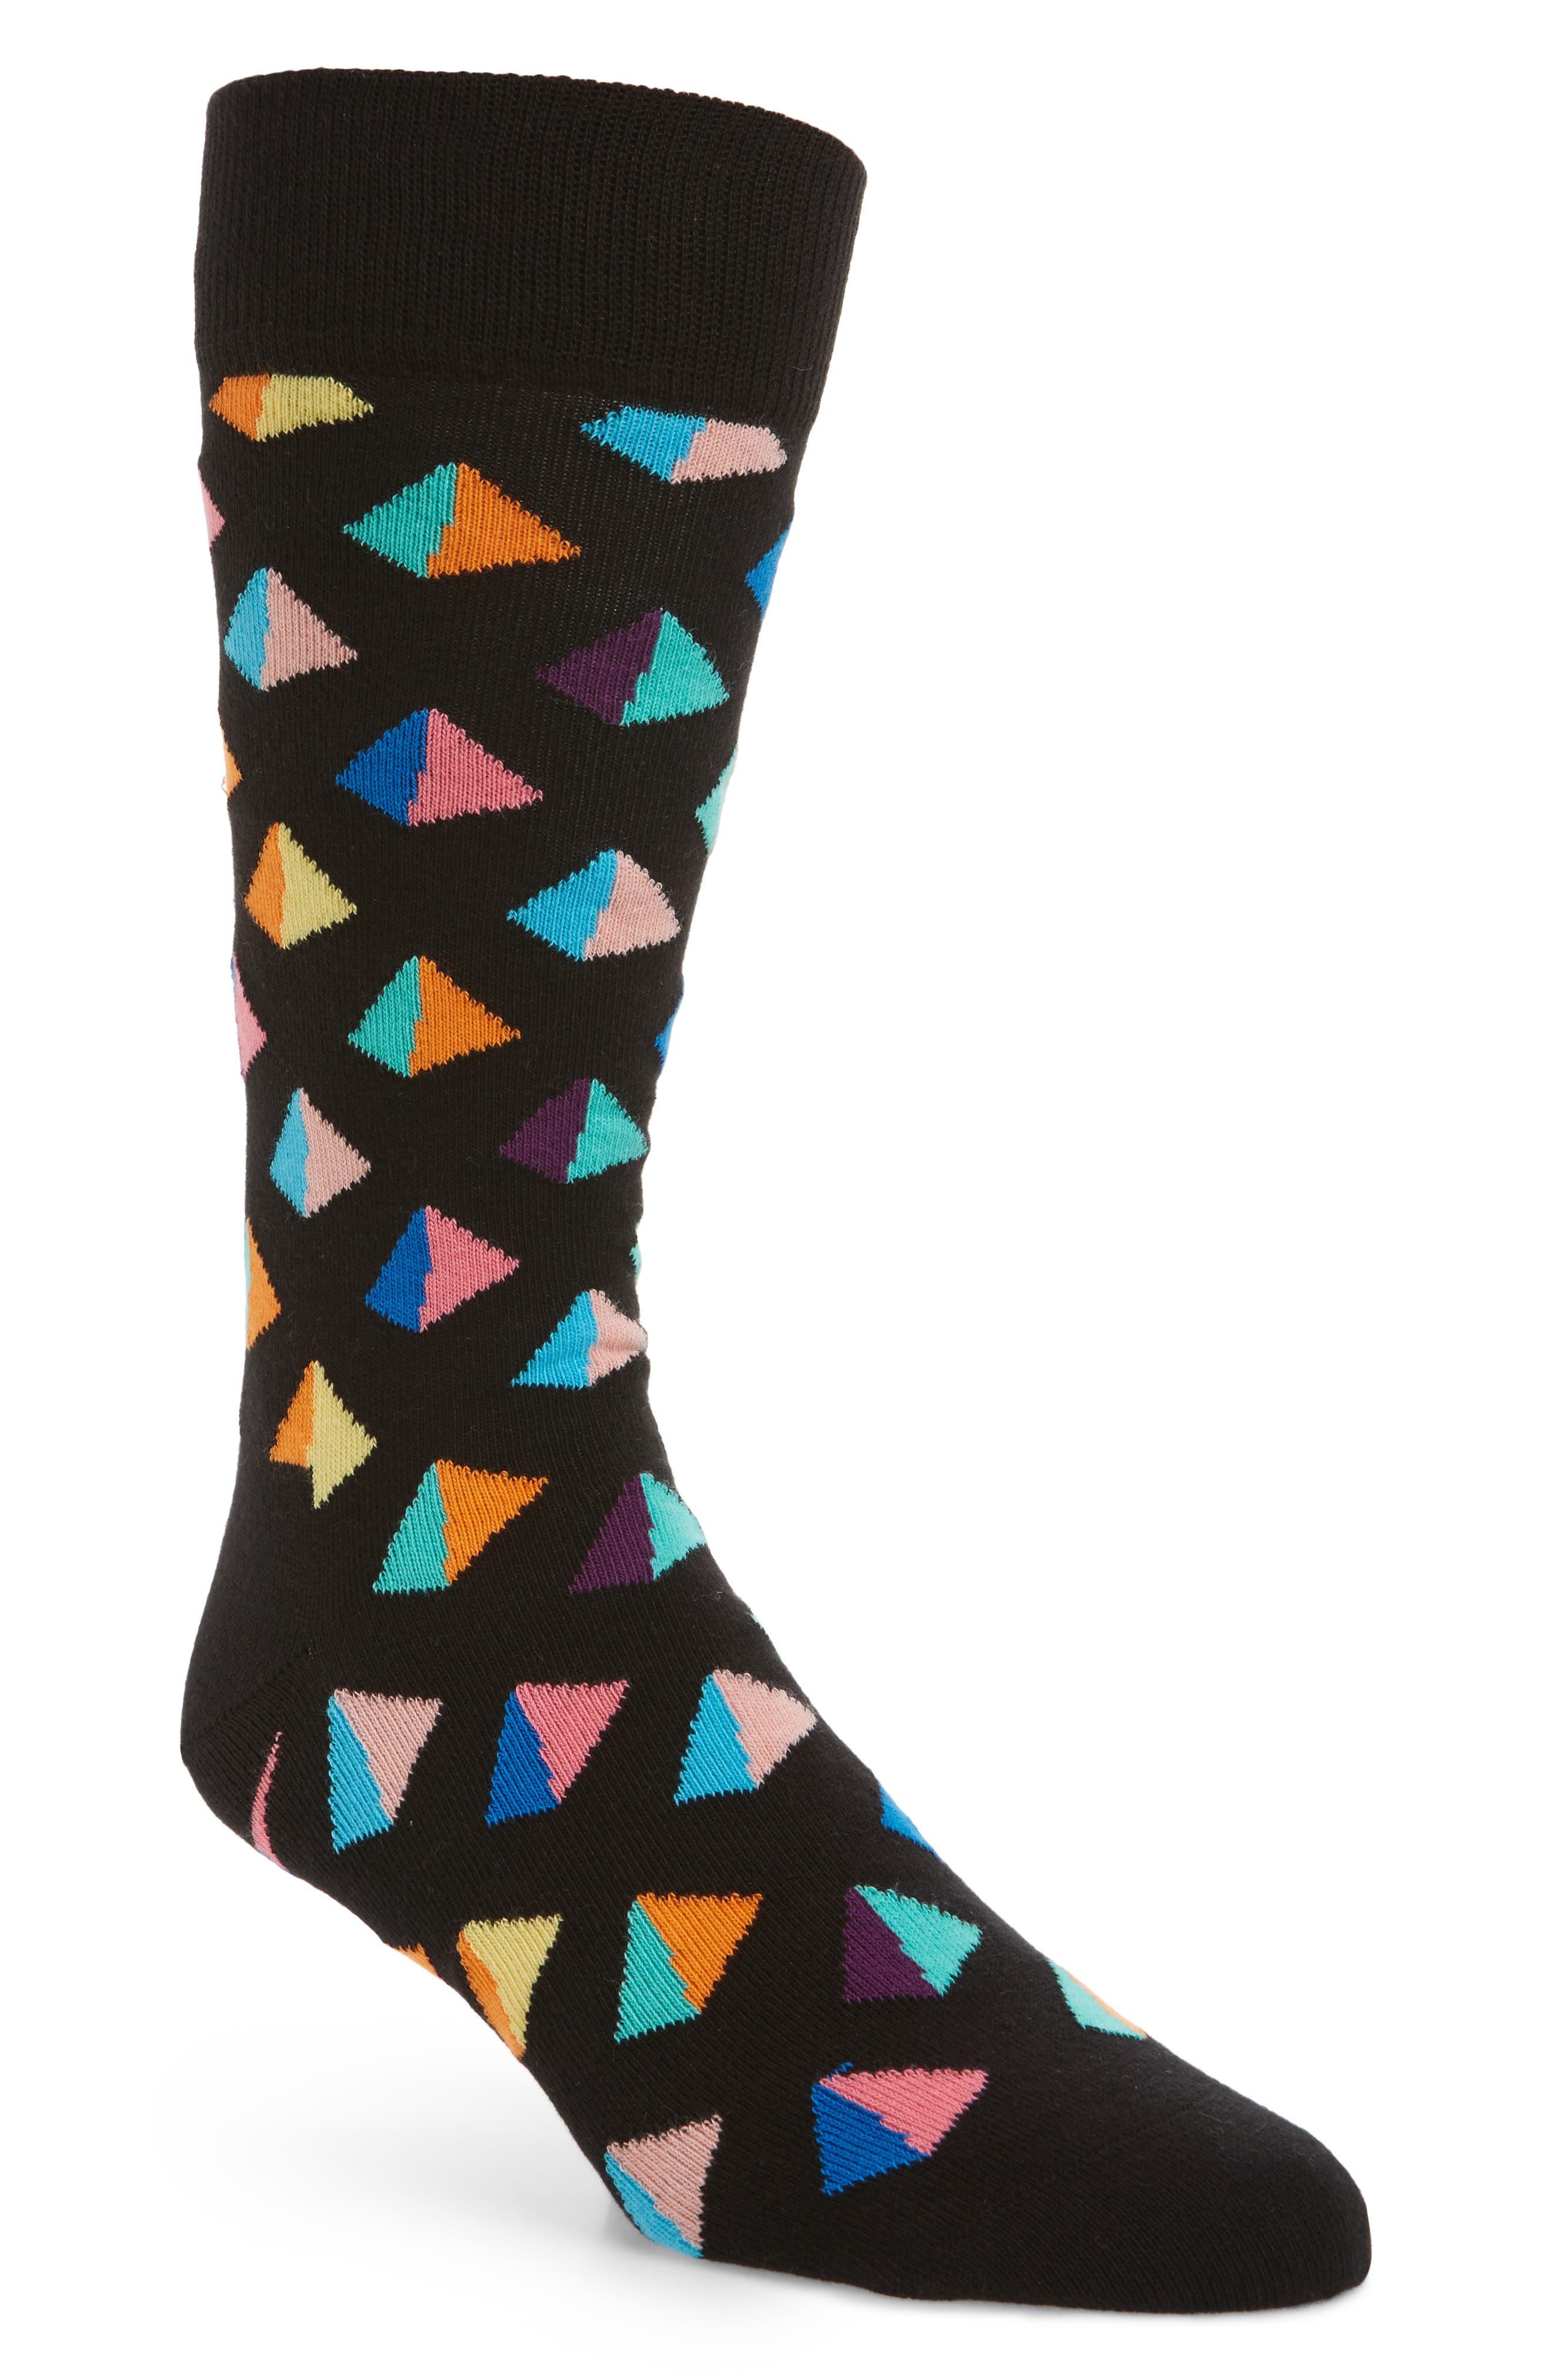 Pyramid Socks,                         Main,                         color, Black Multi